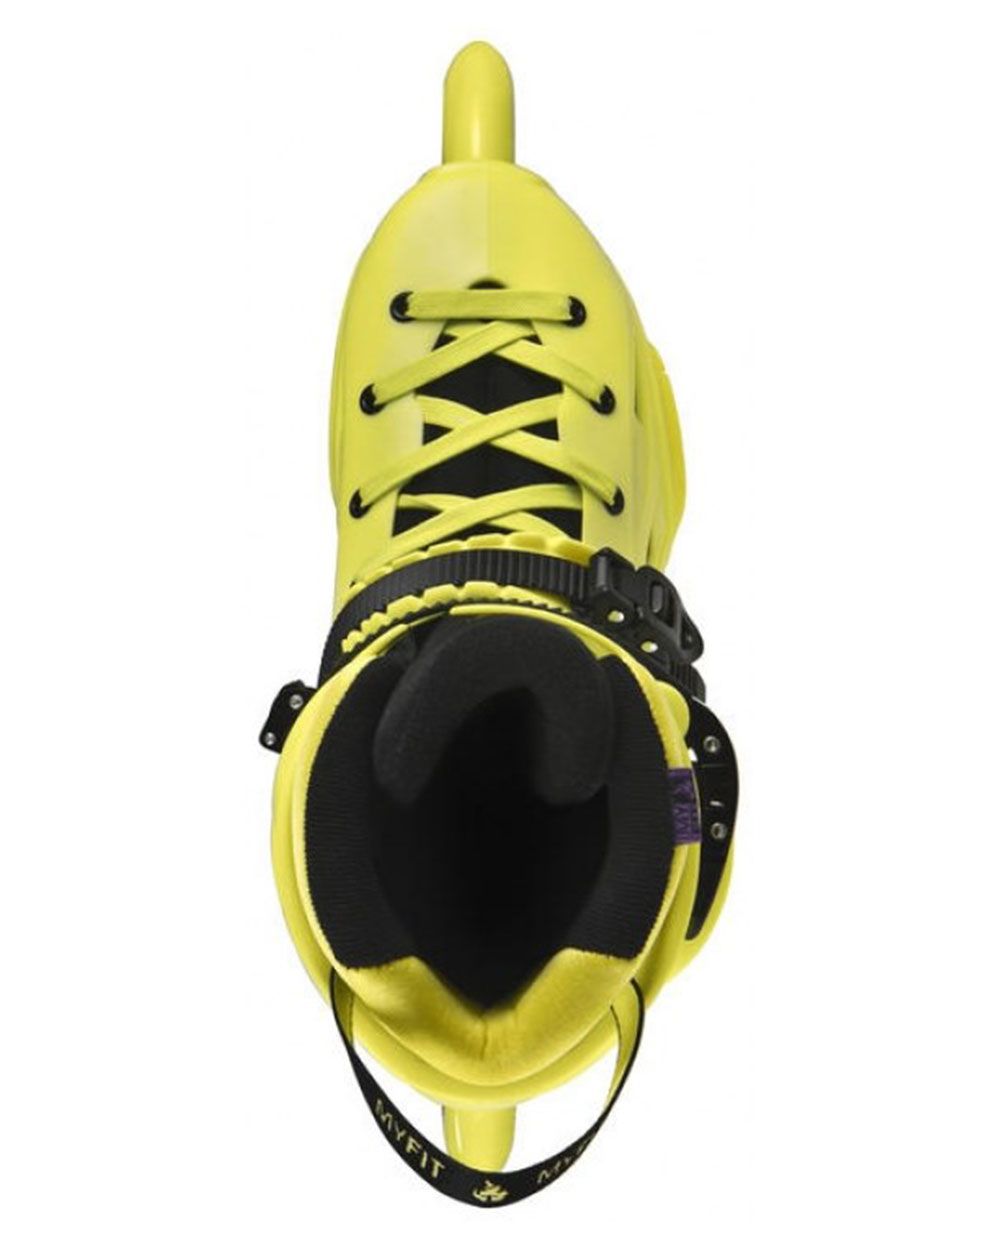 Powerslide Imperial Yellow: POWERSLIDE Imperial Megacruiser 125, Neon Yellow 2017